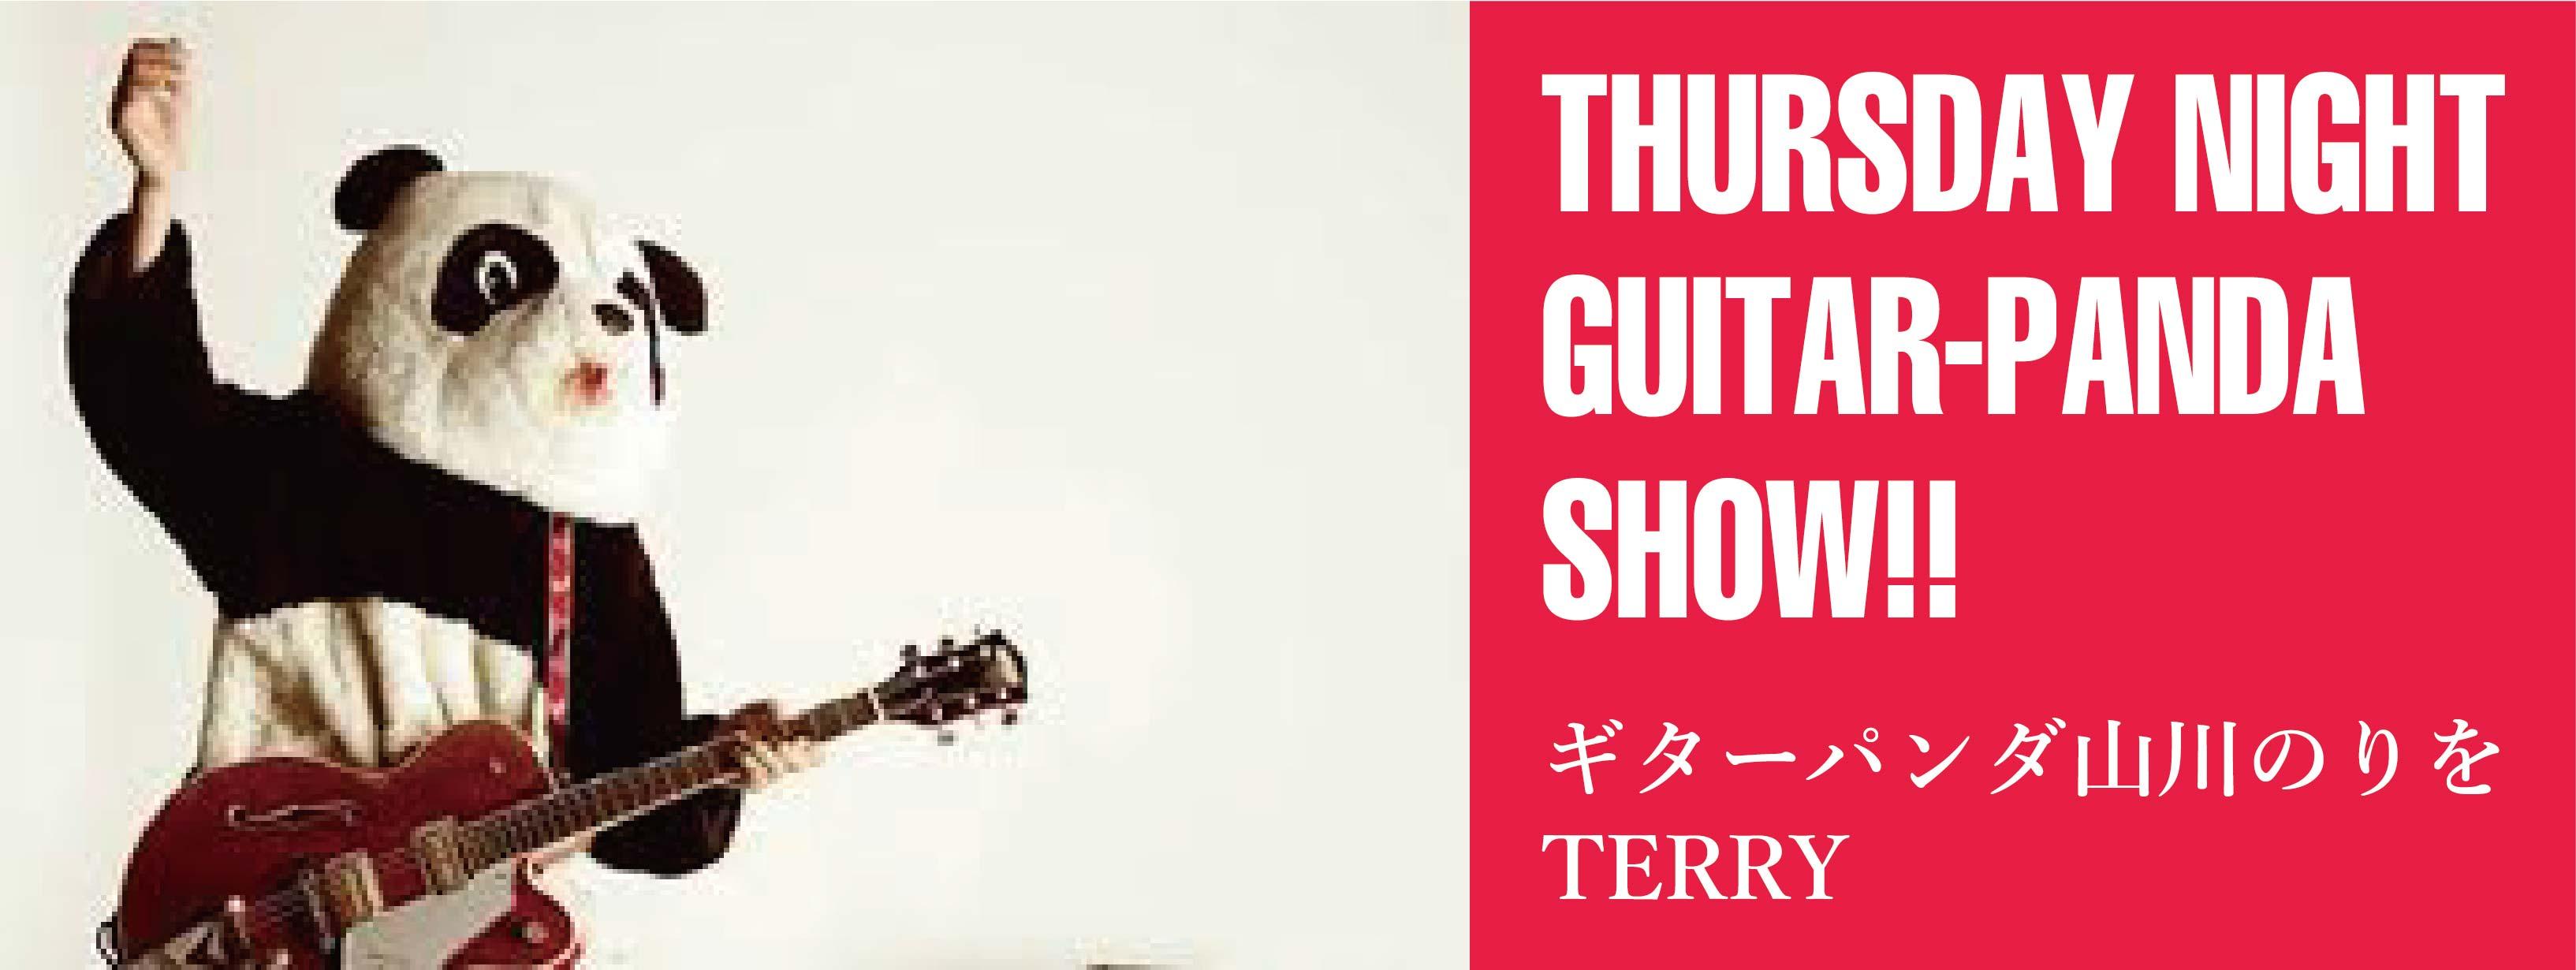 THURSDAY NIGHT GUITAR-PANDA SHOW!!